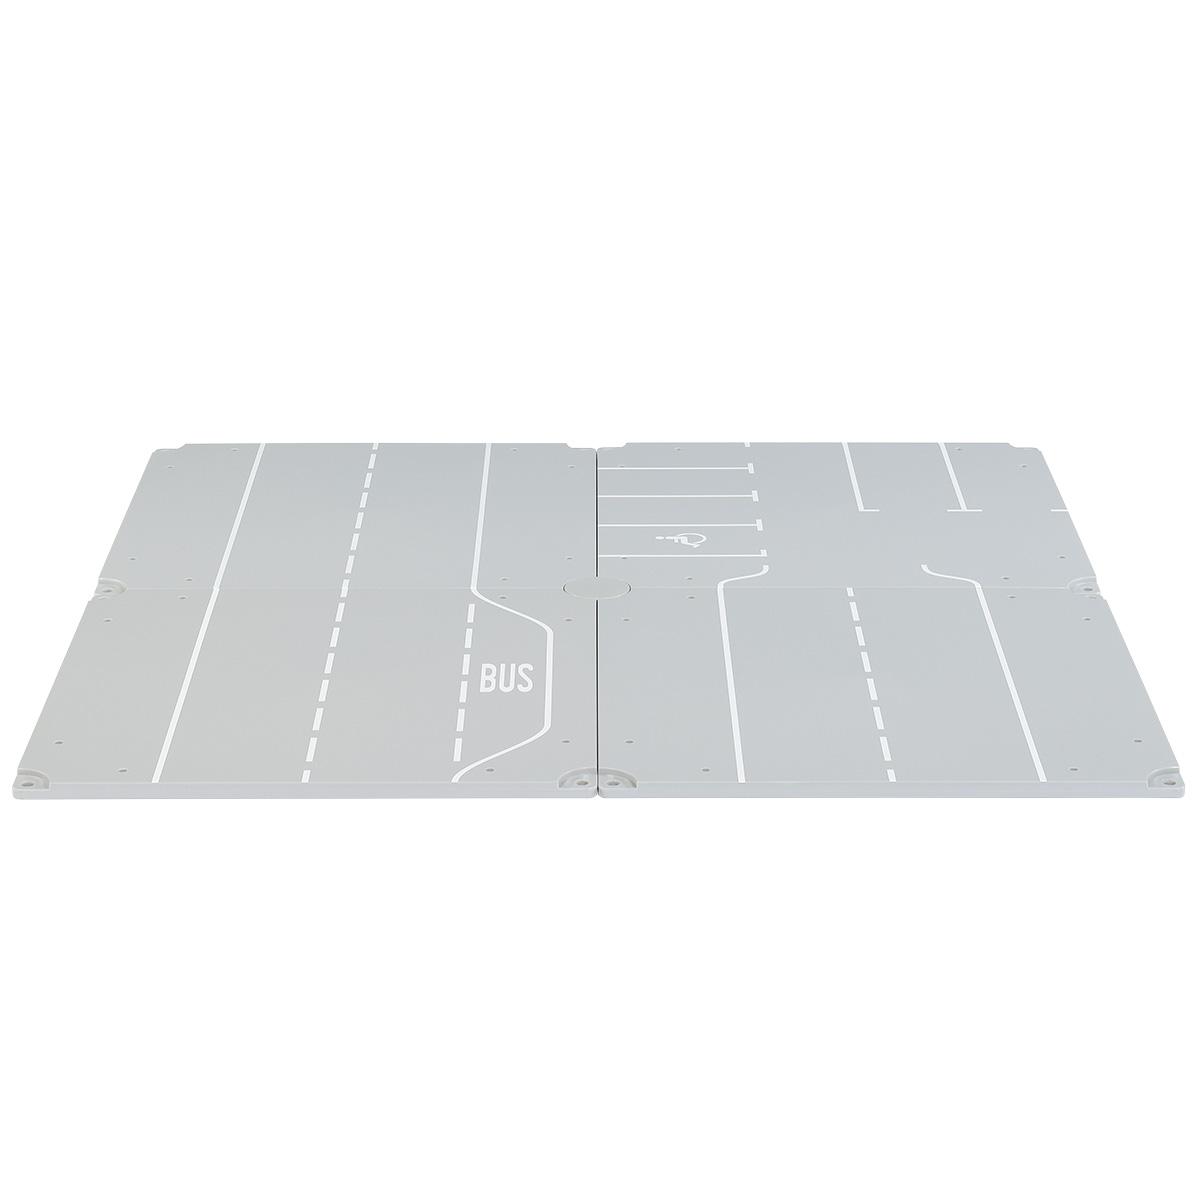 SIKU WORLD用アクセサリー パネル4枚セット(直線 駐車場) (ジク・SIKU)